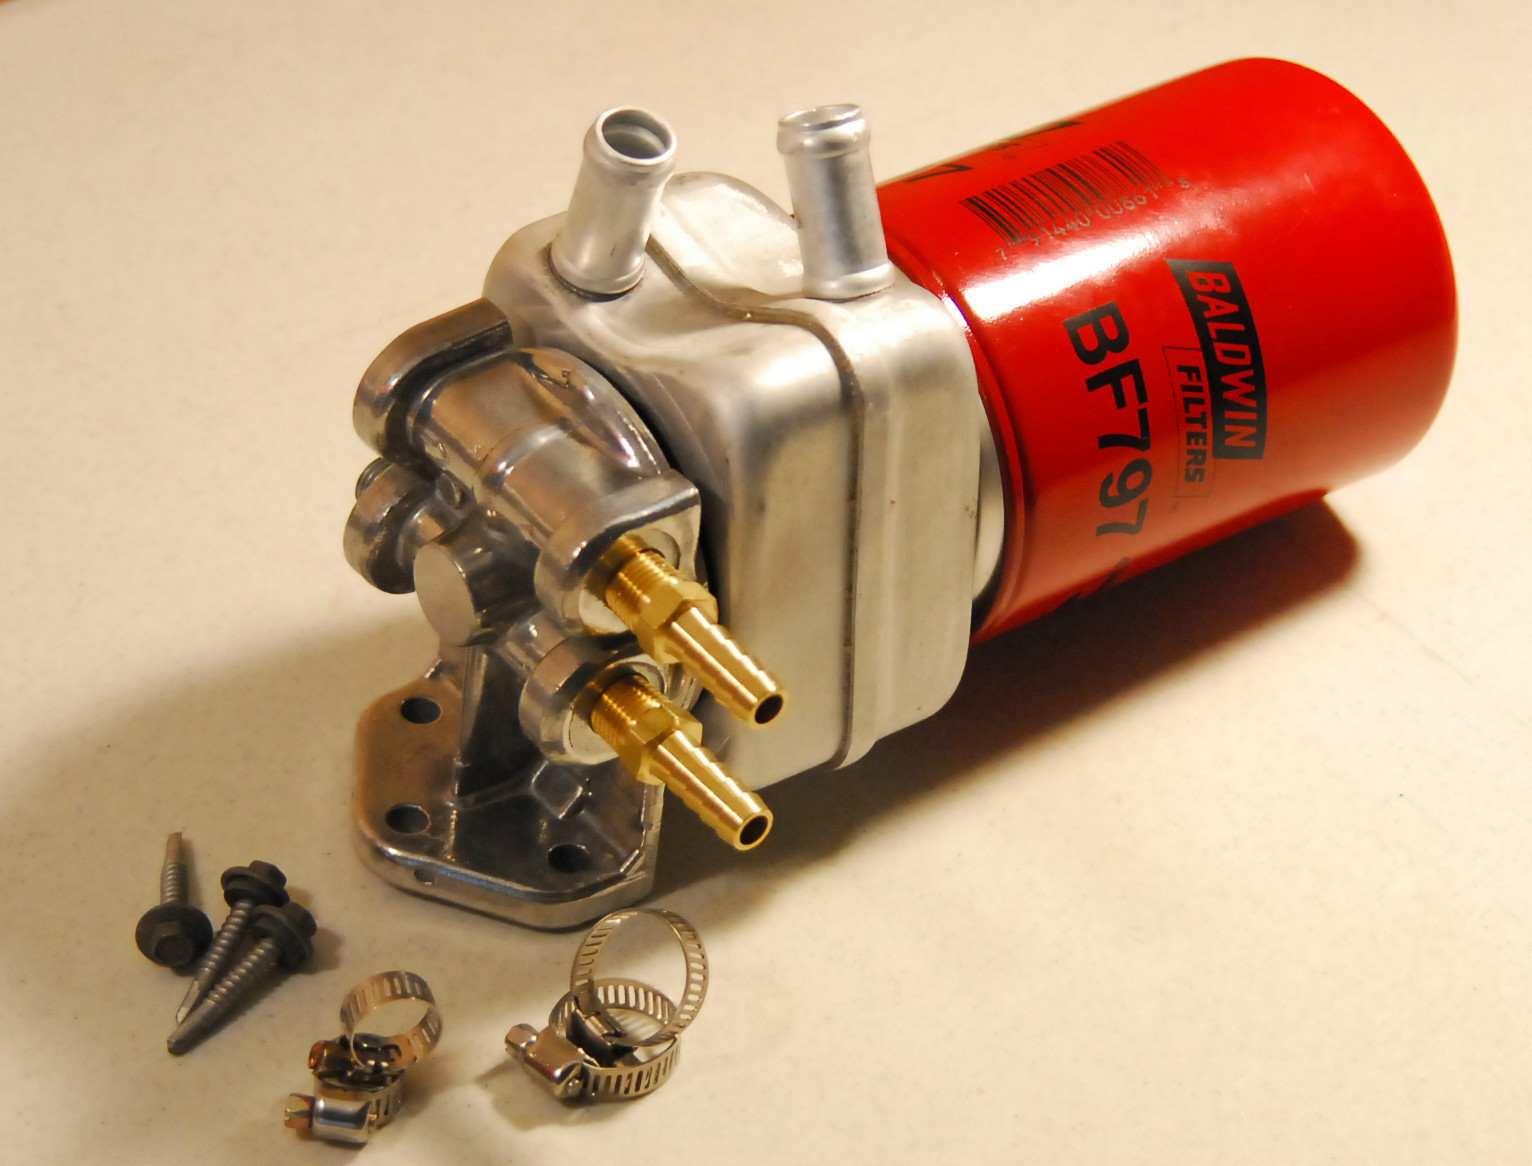 hight resolution of fuel heater for 4 micron filter wasteoilheaterh2o oil wmo wvo bio svo